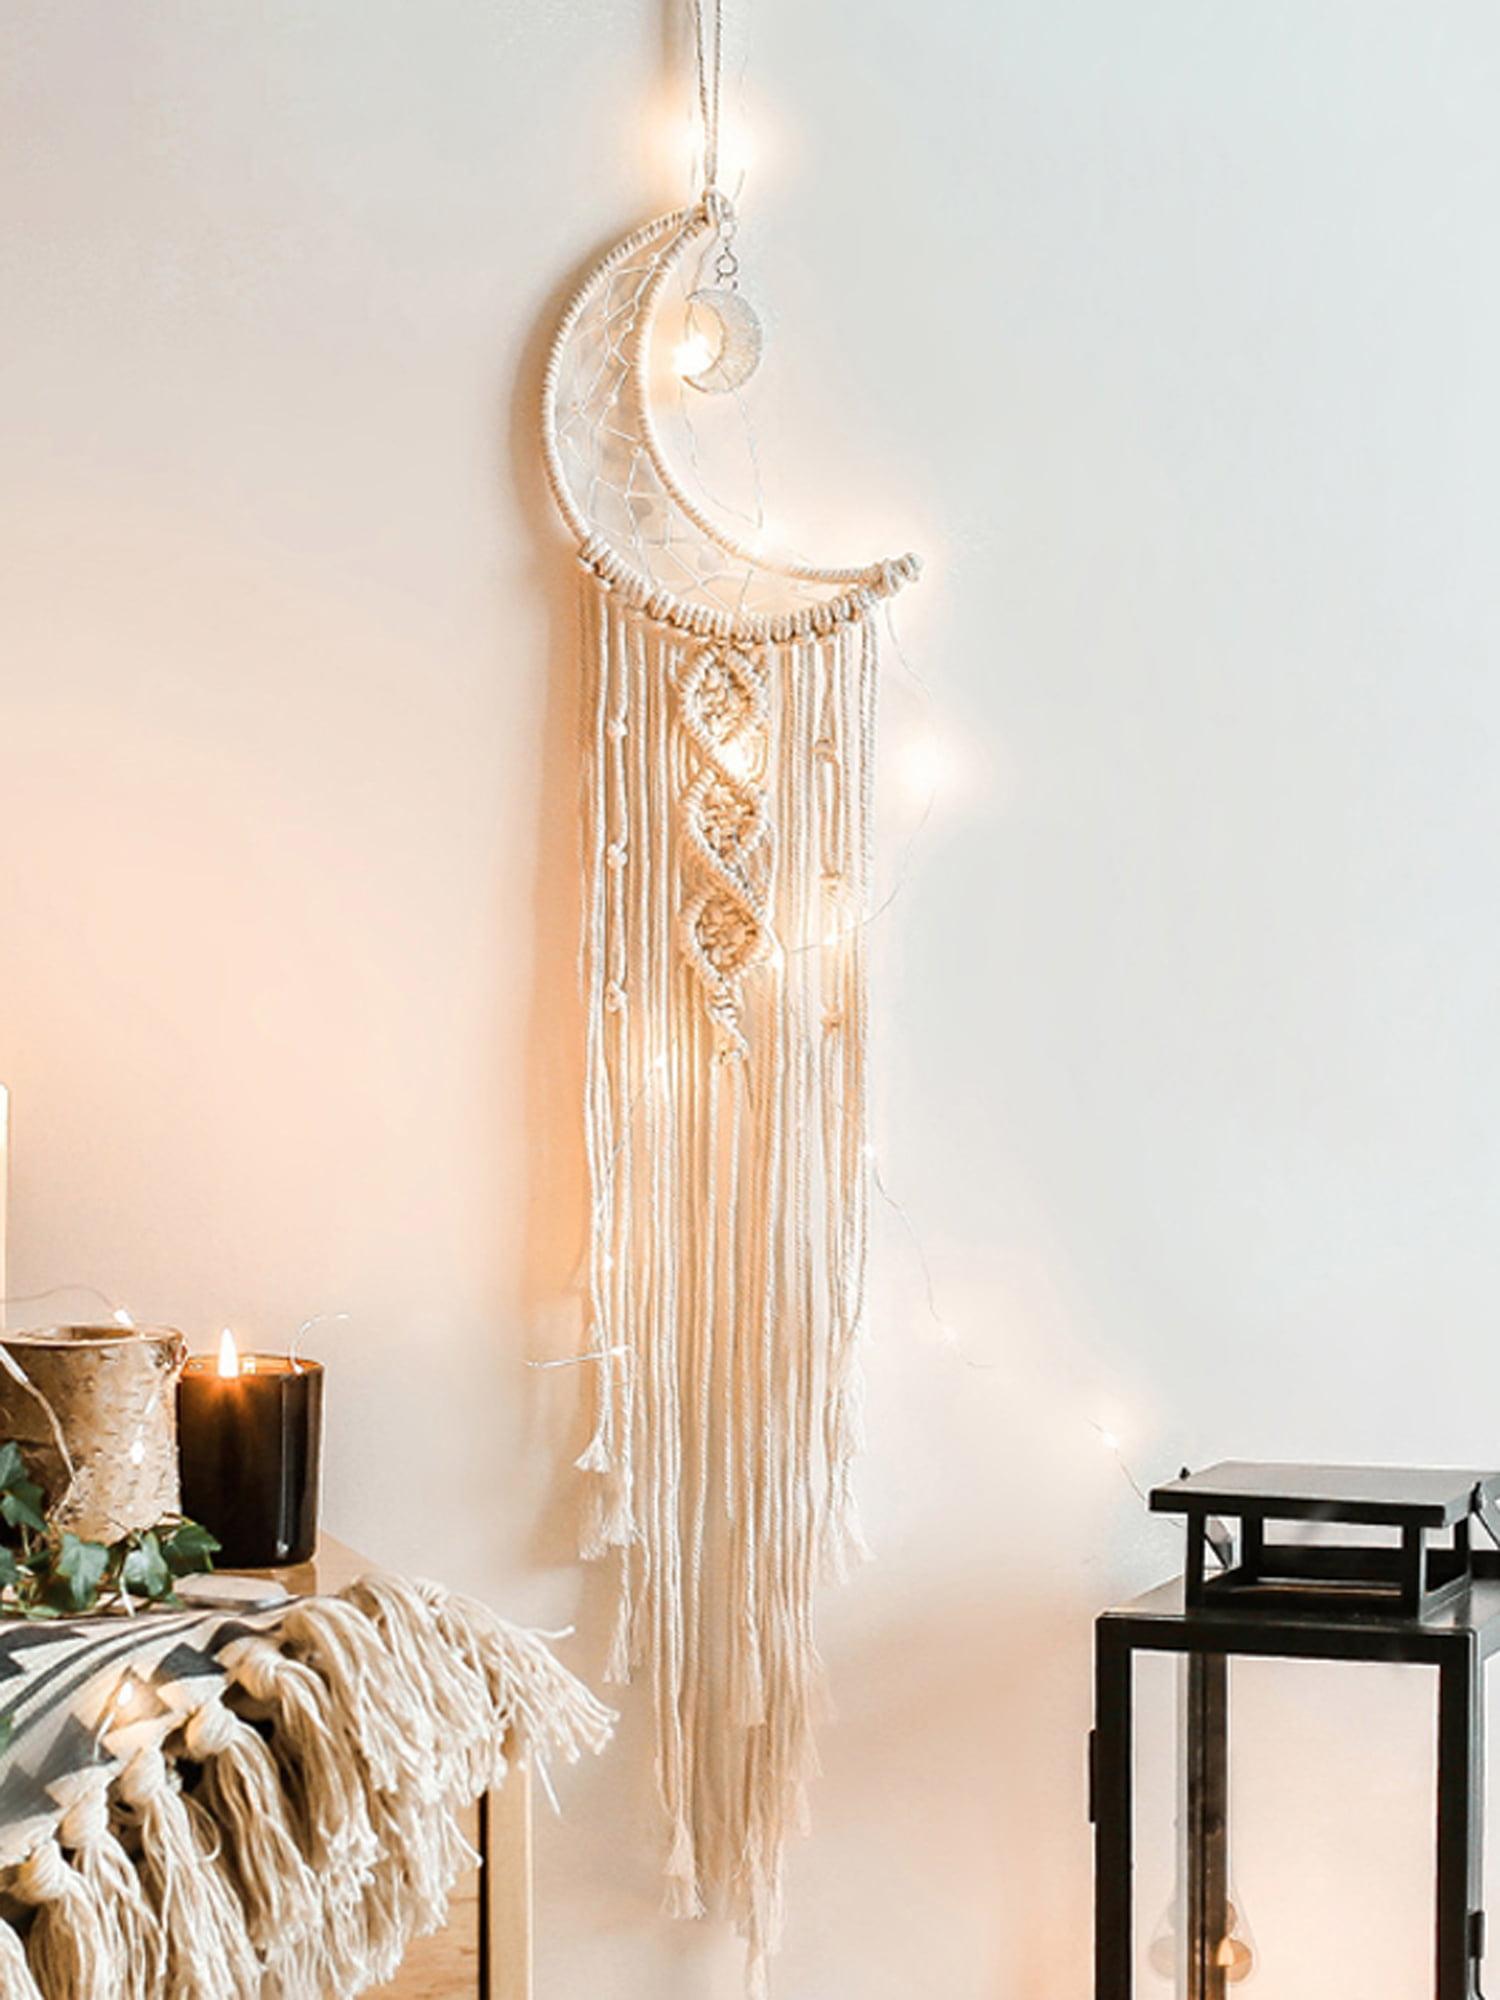 Macrame Woven Wall Hanging Tapestry Boho Chic Bohemian Home Art Decor Handmade